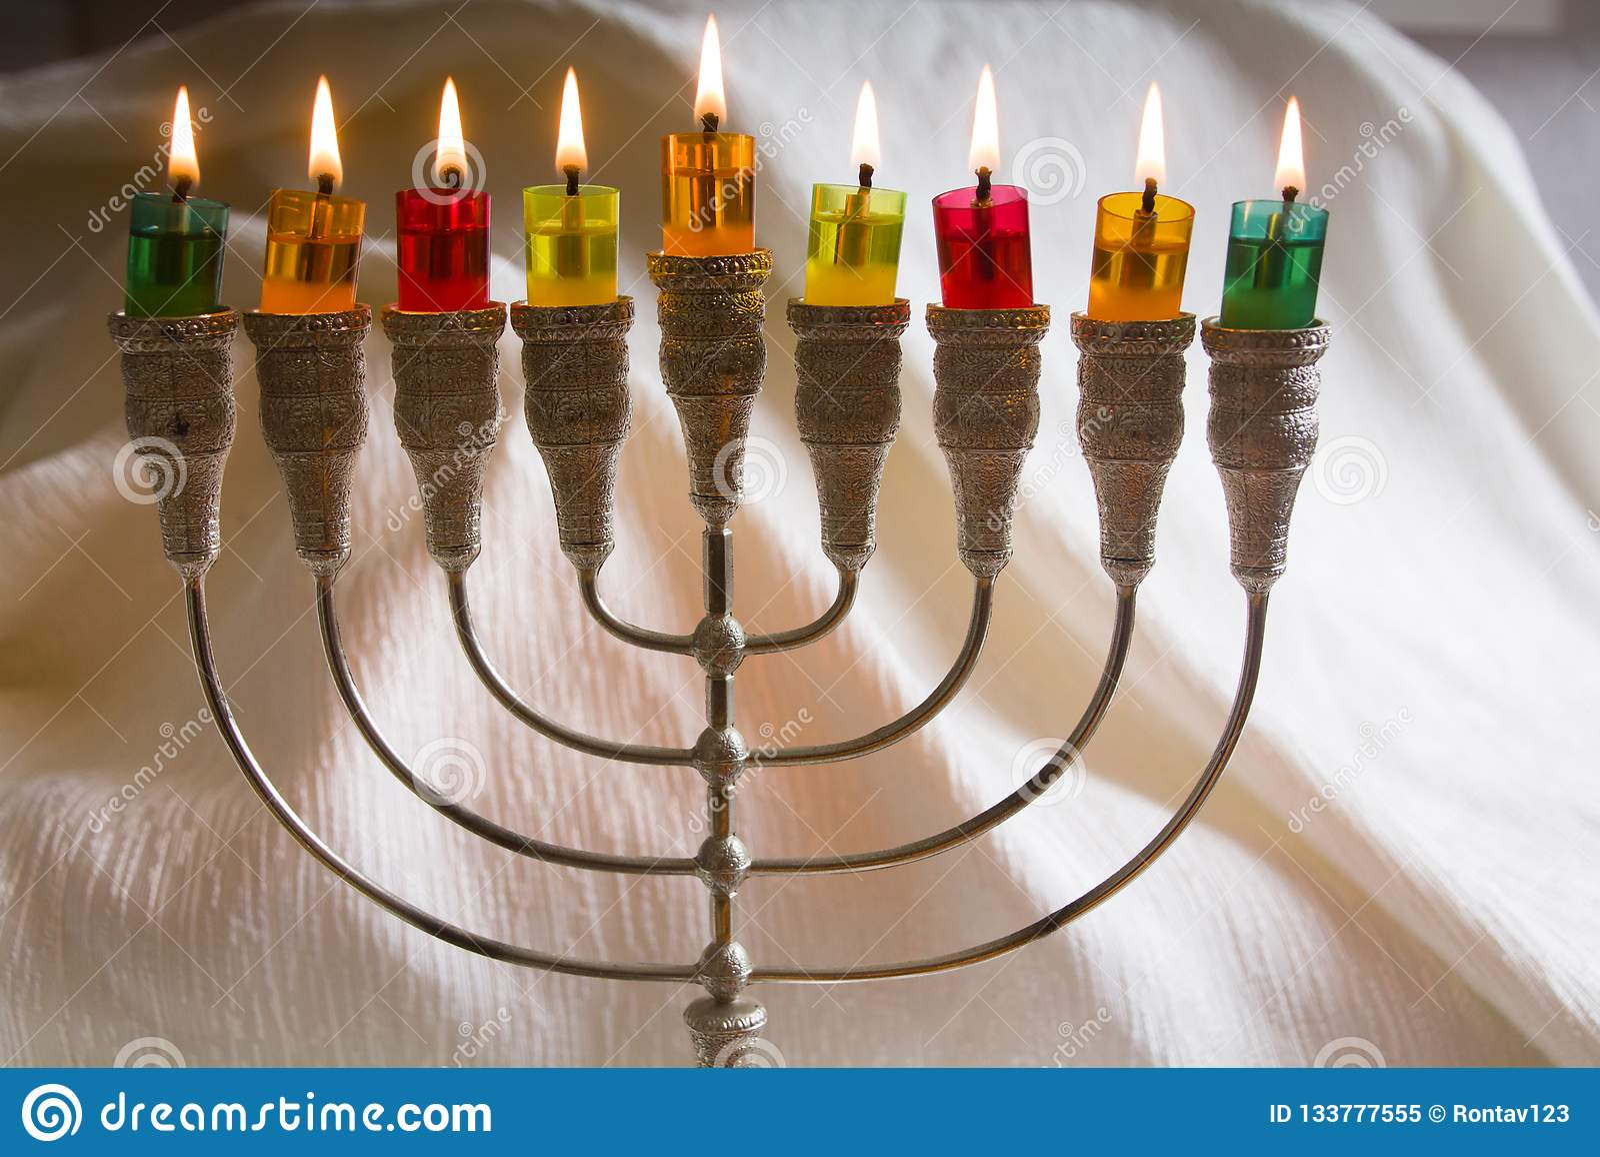 Jewish holiday Hanukkah symbol - The Menorah traditional candelabra and burning candles